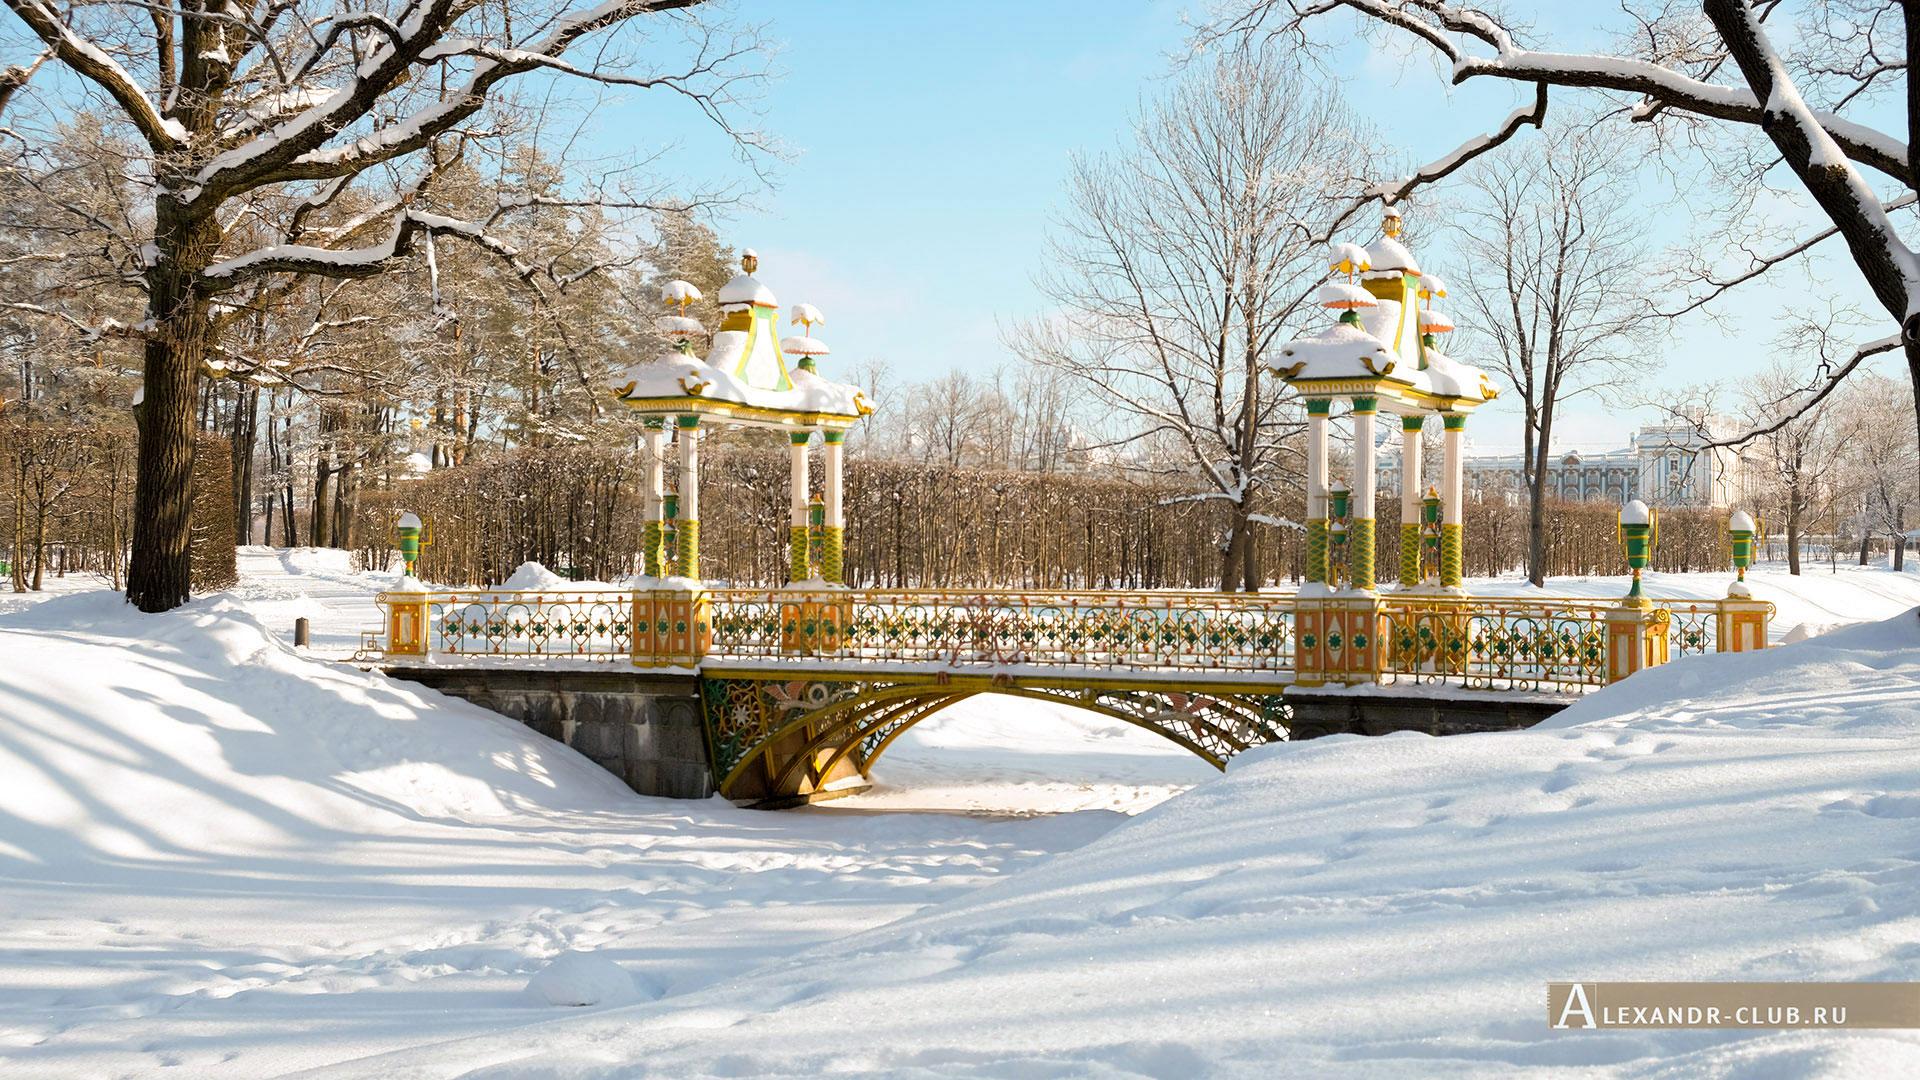 Пушкин, Царское Село, зима, Александровский парк, Китайские мостик